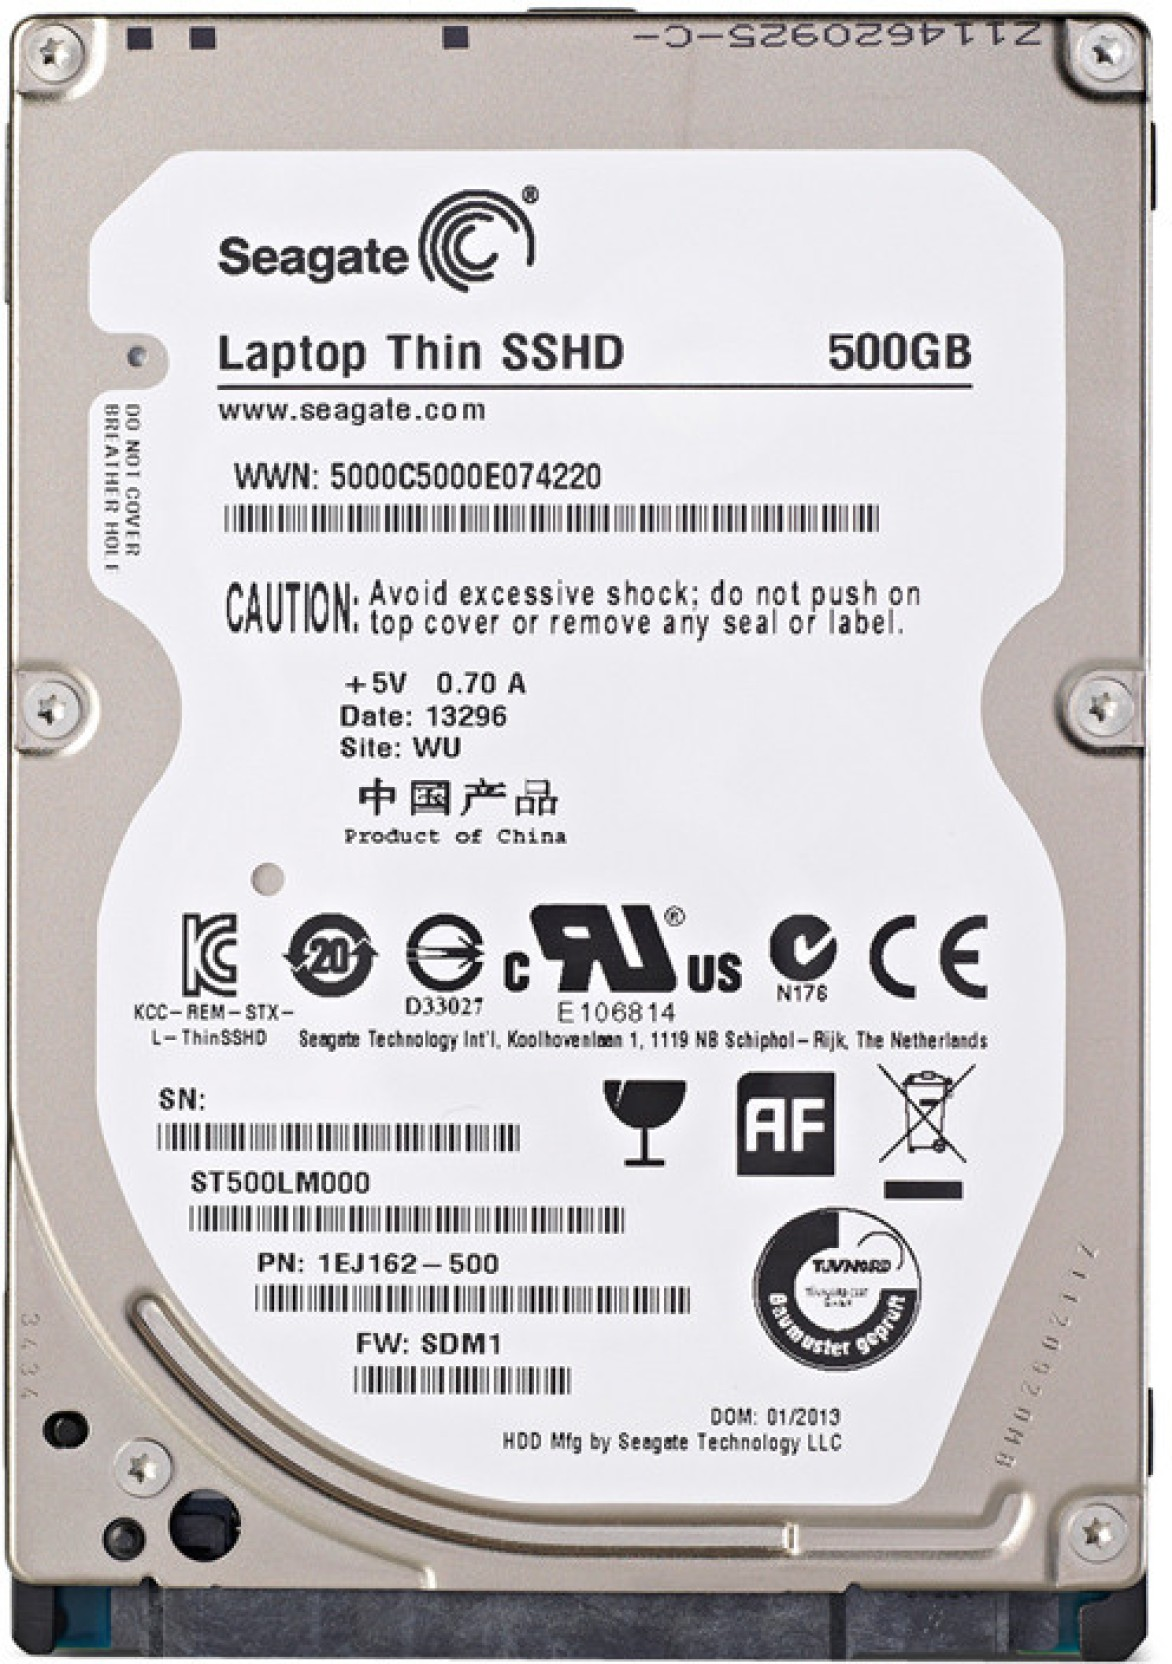 Seagate Ssd 500 Gb Laptop Internal Solid State Drive Sshd 25 Hardisk 120gb Sata Home